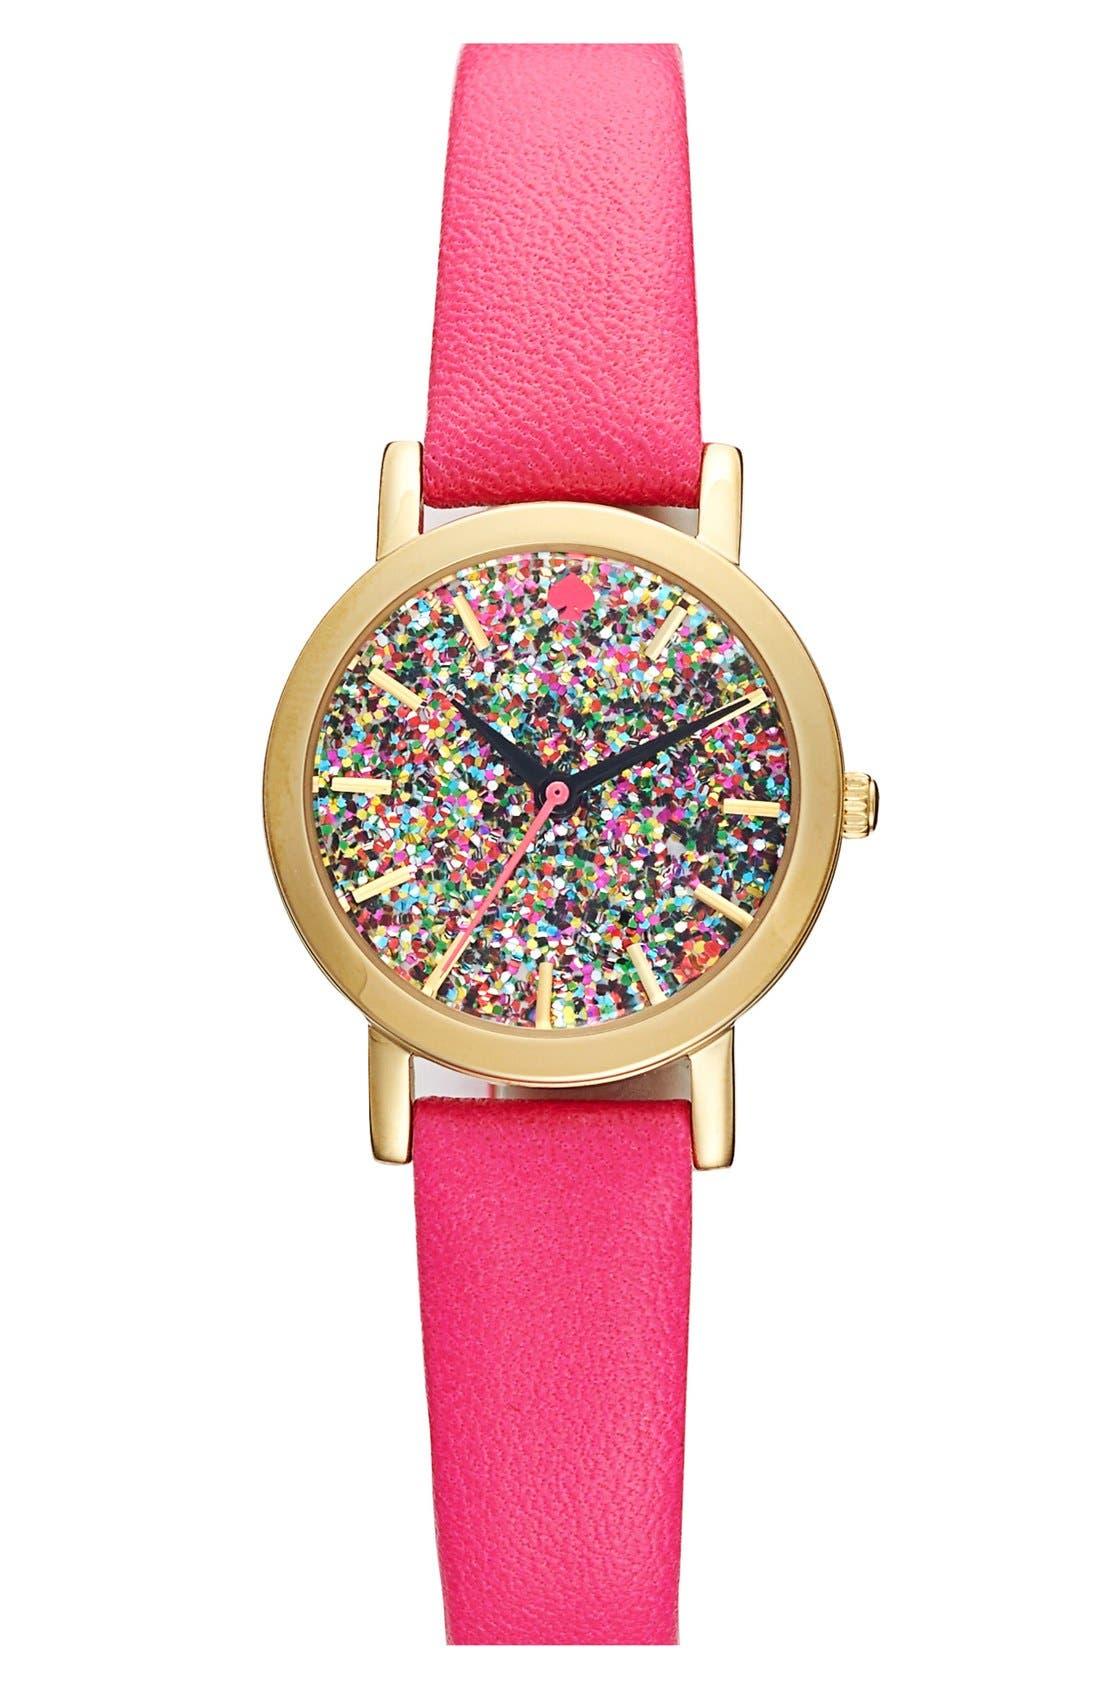 Alternate Image 1 Selected - kate spade new york 'metro mini' glitter dial watch, 24mm